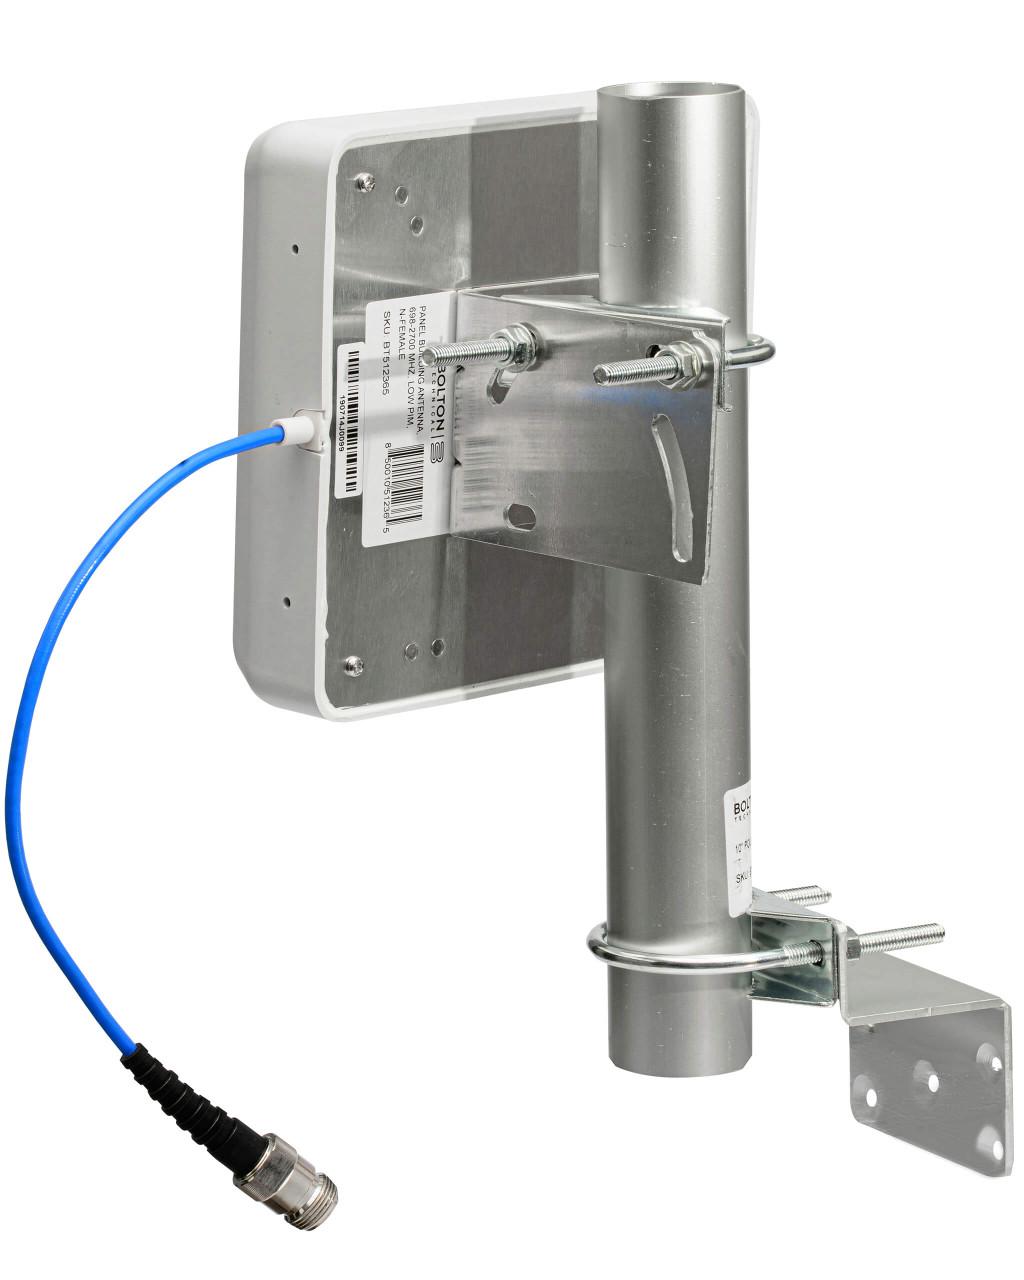 The Indoor Board 75 - Indoor Wall Mount Antenna pole mounting